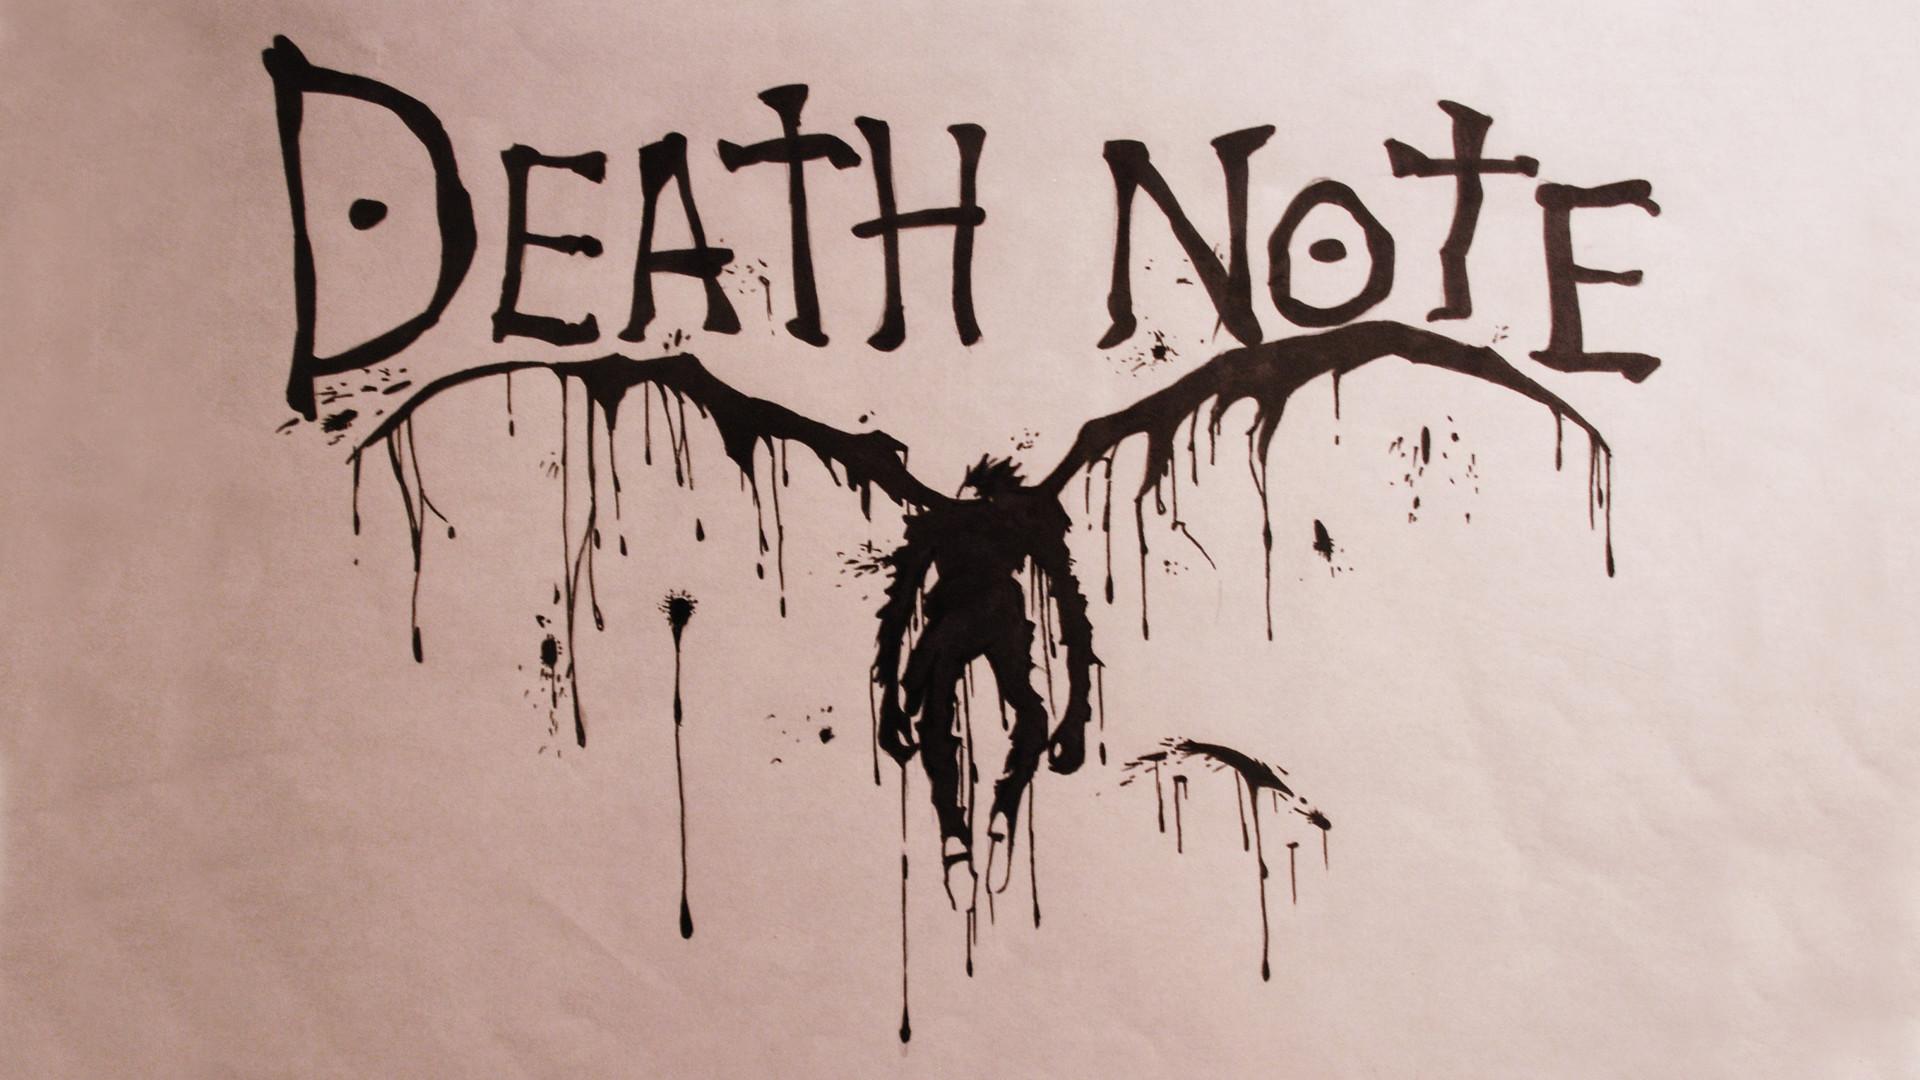 Death Note Wallpaper: Death Note L Wallpaper (59+ Images